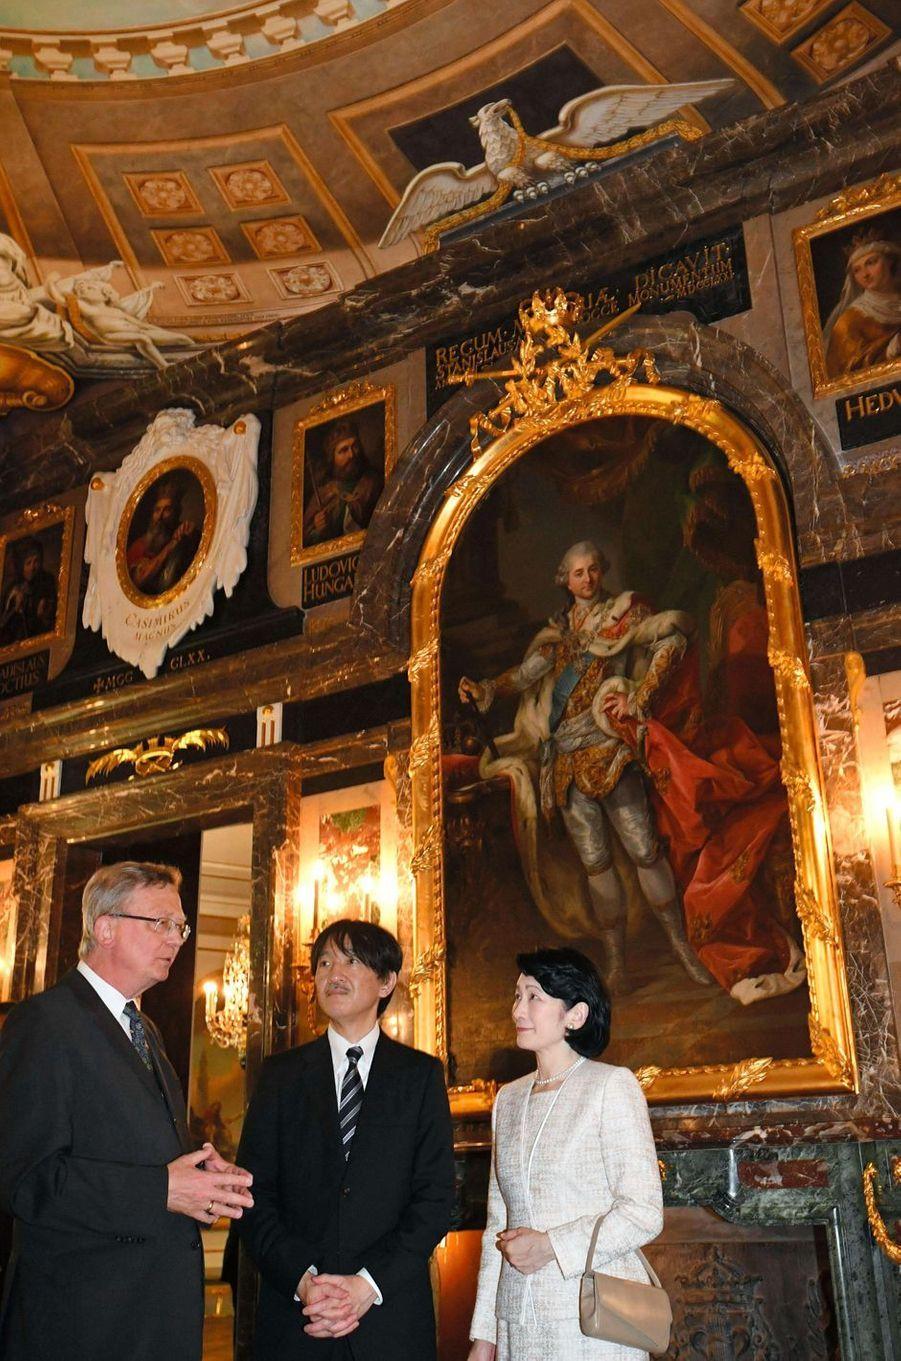 La princesse Kiko du Japon et le prince Fumihito d'Akishino à Varsovie, le 28 juin 2019